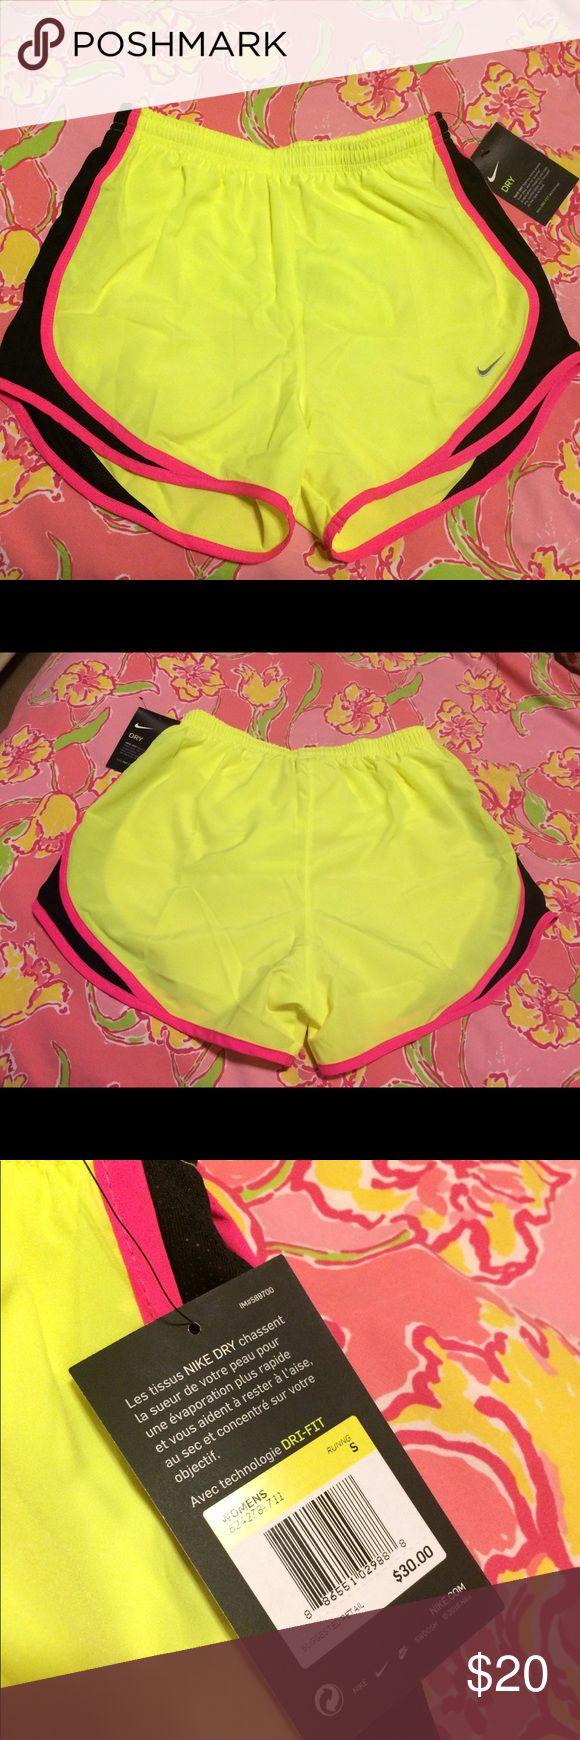 NWT Nike Dri Fit shorts small No trades... new with tags. Nike Dri Fit shorts. Neon yellow with pink & black trim. Size womens small. Nike Shorts